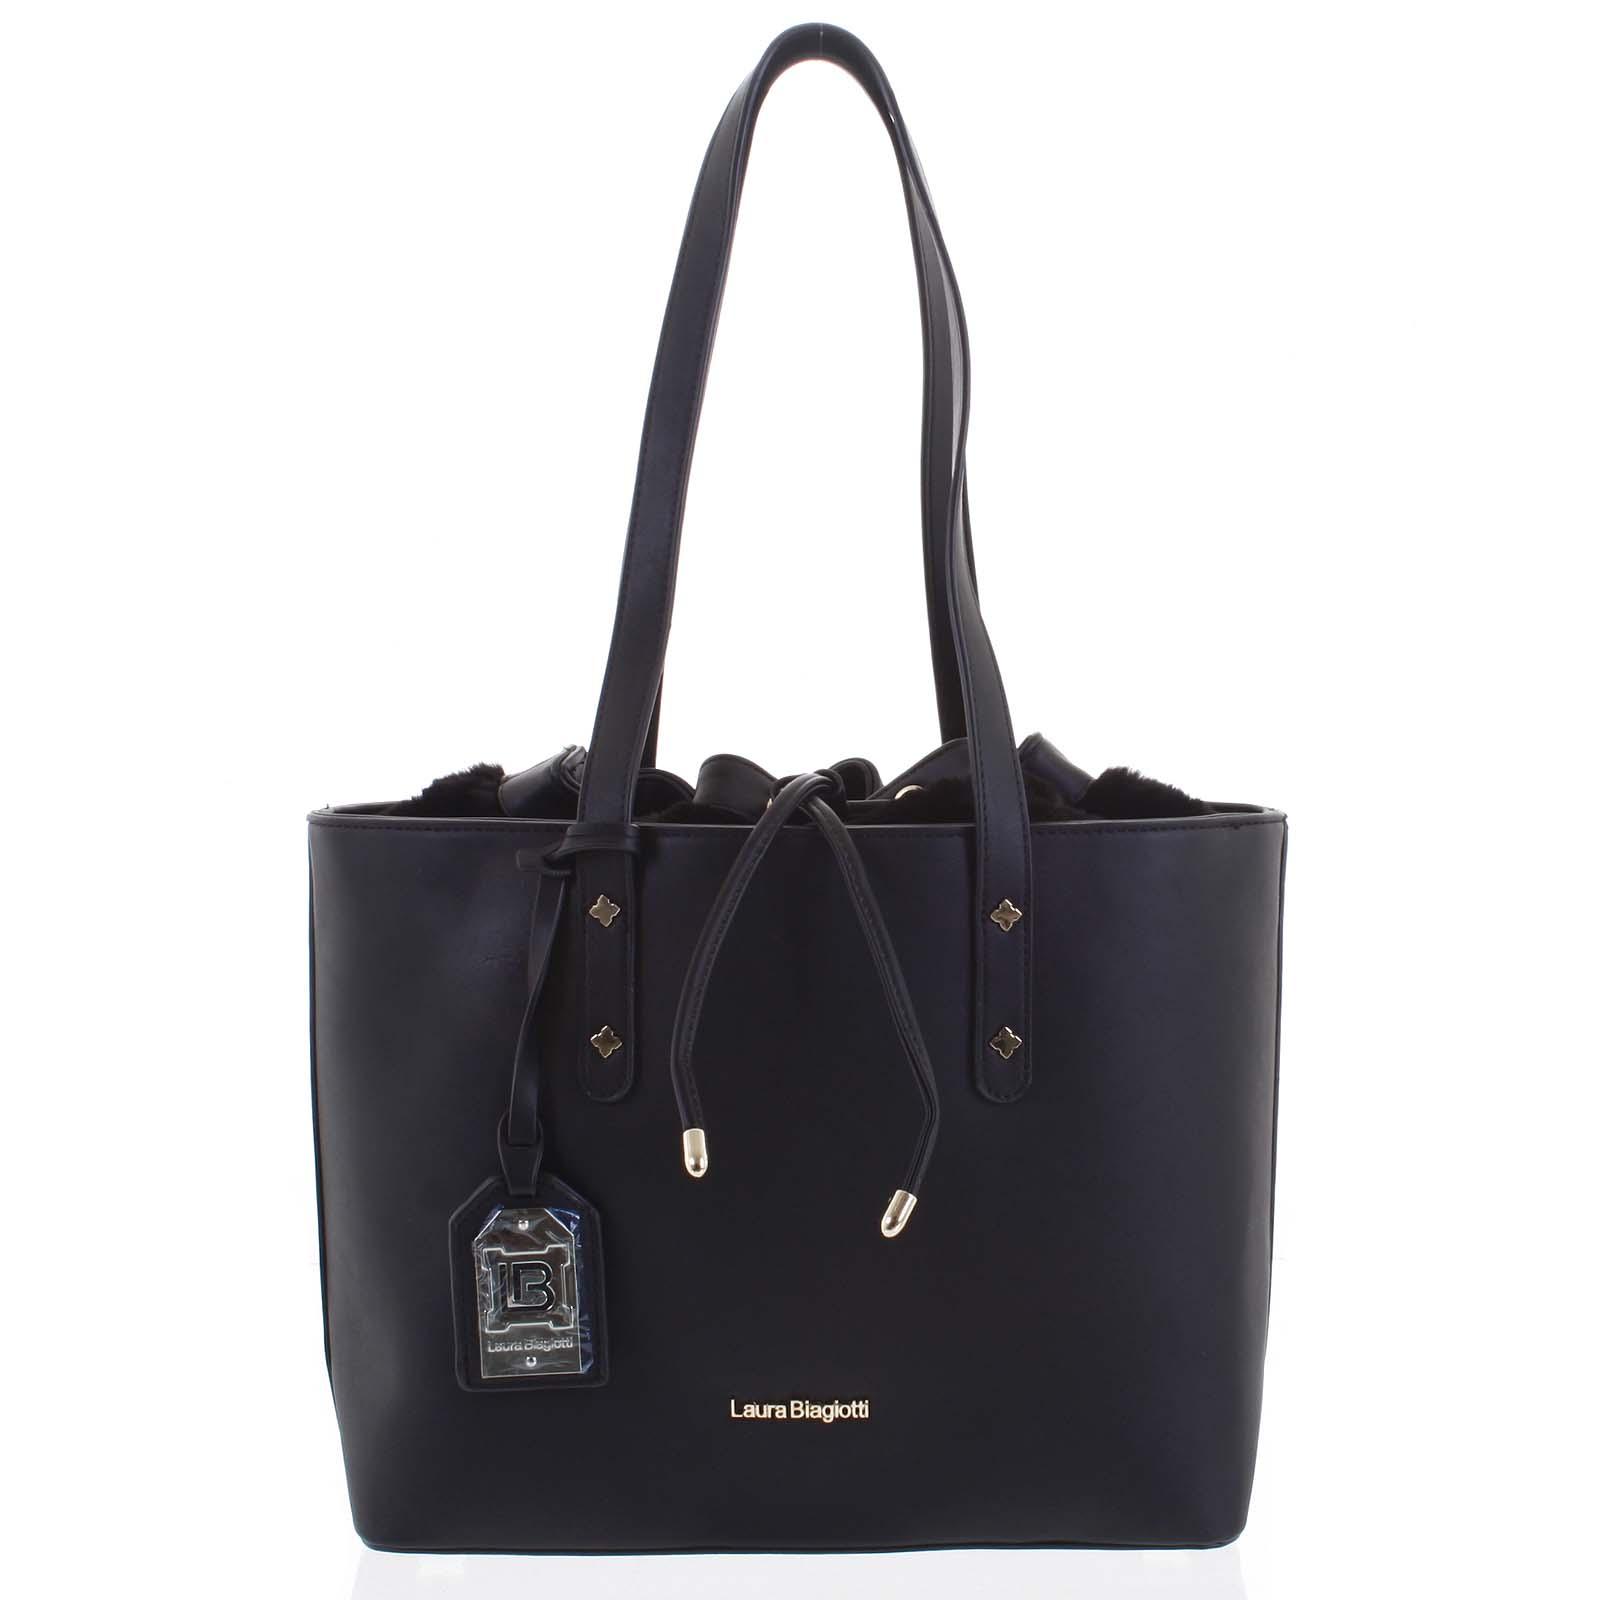 Dámska kabelka cez plece čierna - Laura Biagiotti Violet